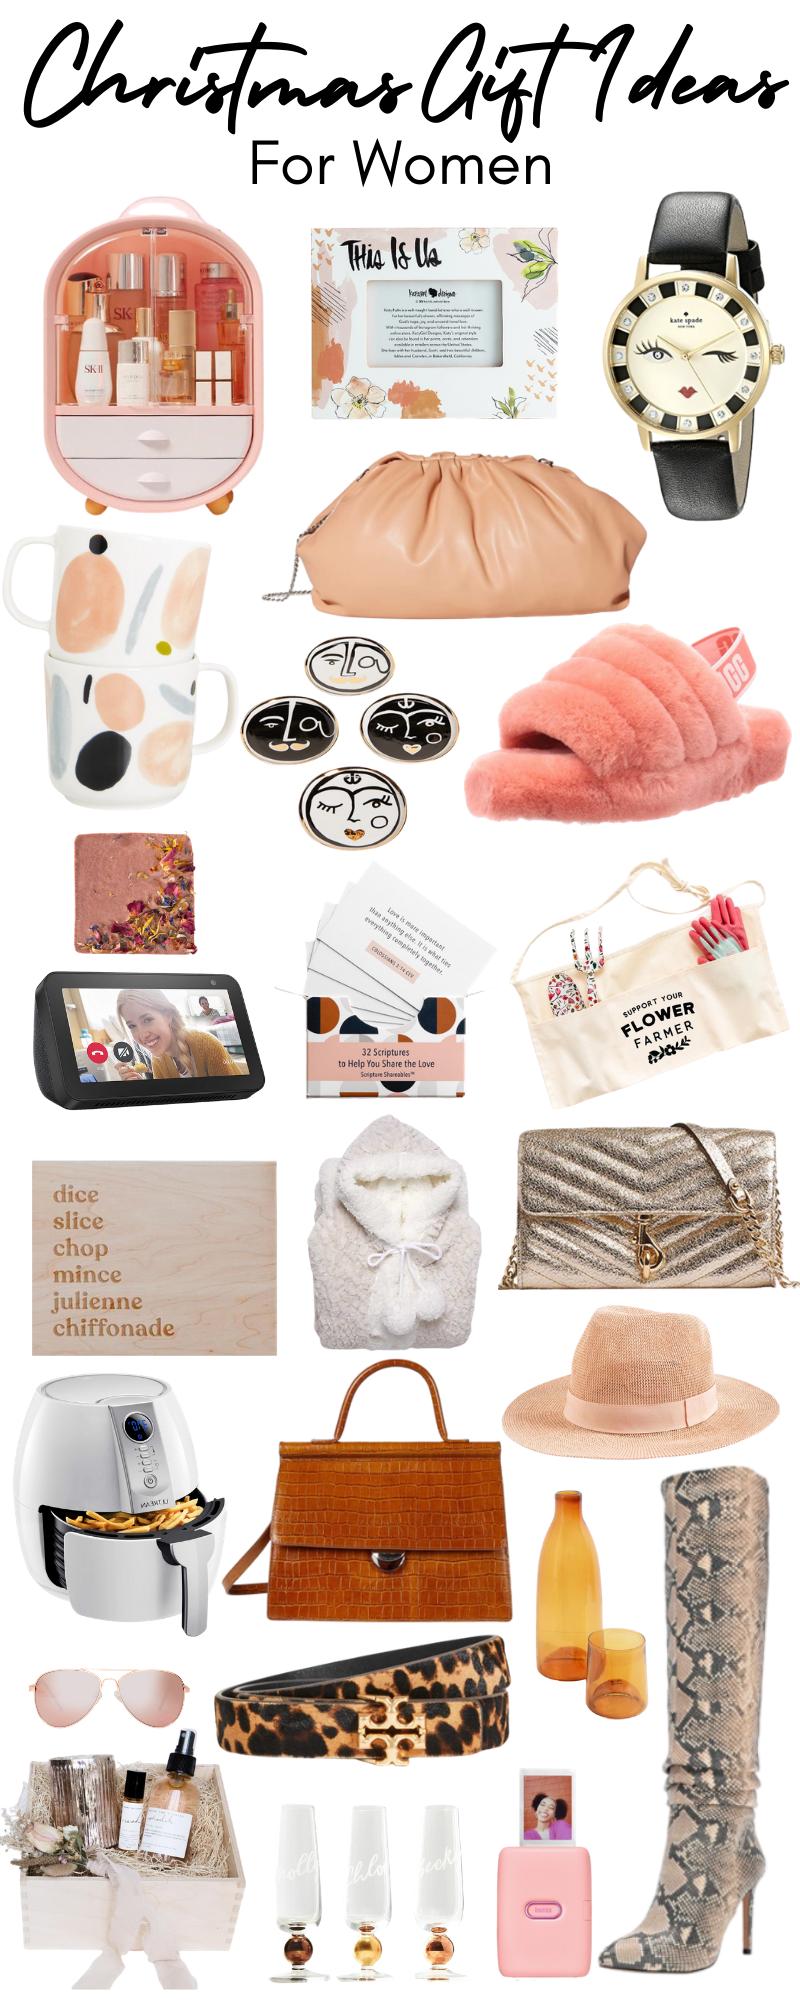 24 Christmas Gift Ideas For Women In 2020 Best Secret Santa Gifts Christmas Presents For Women Top Womens Christmas Gifts